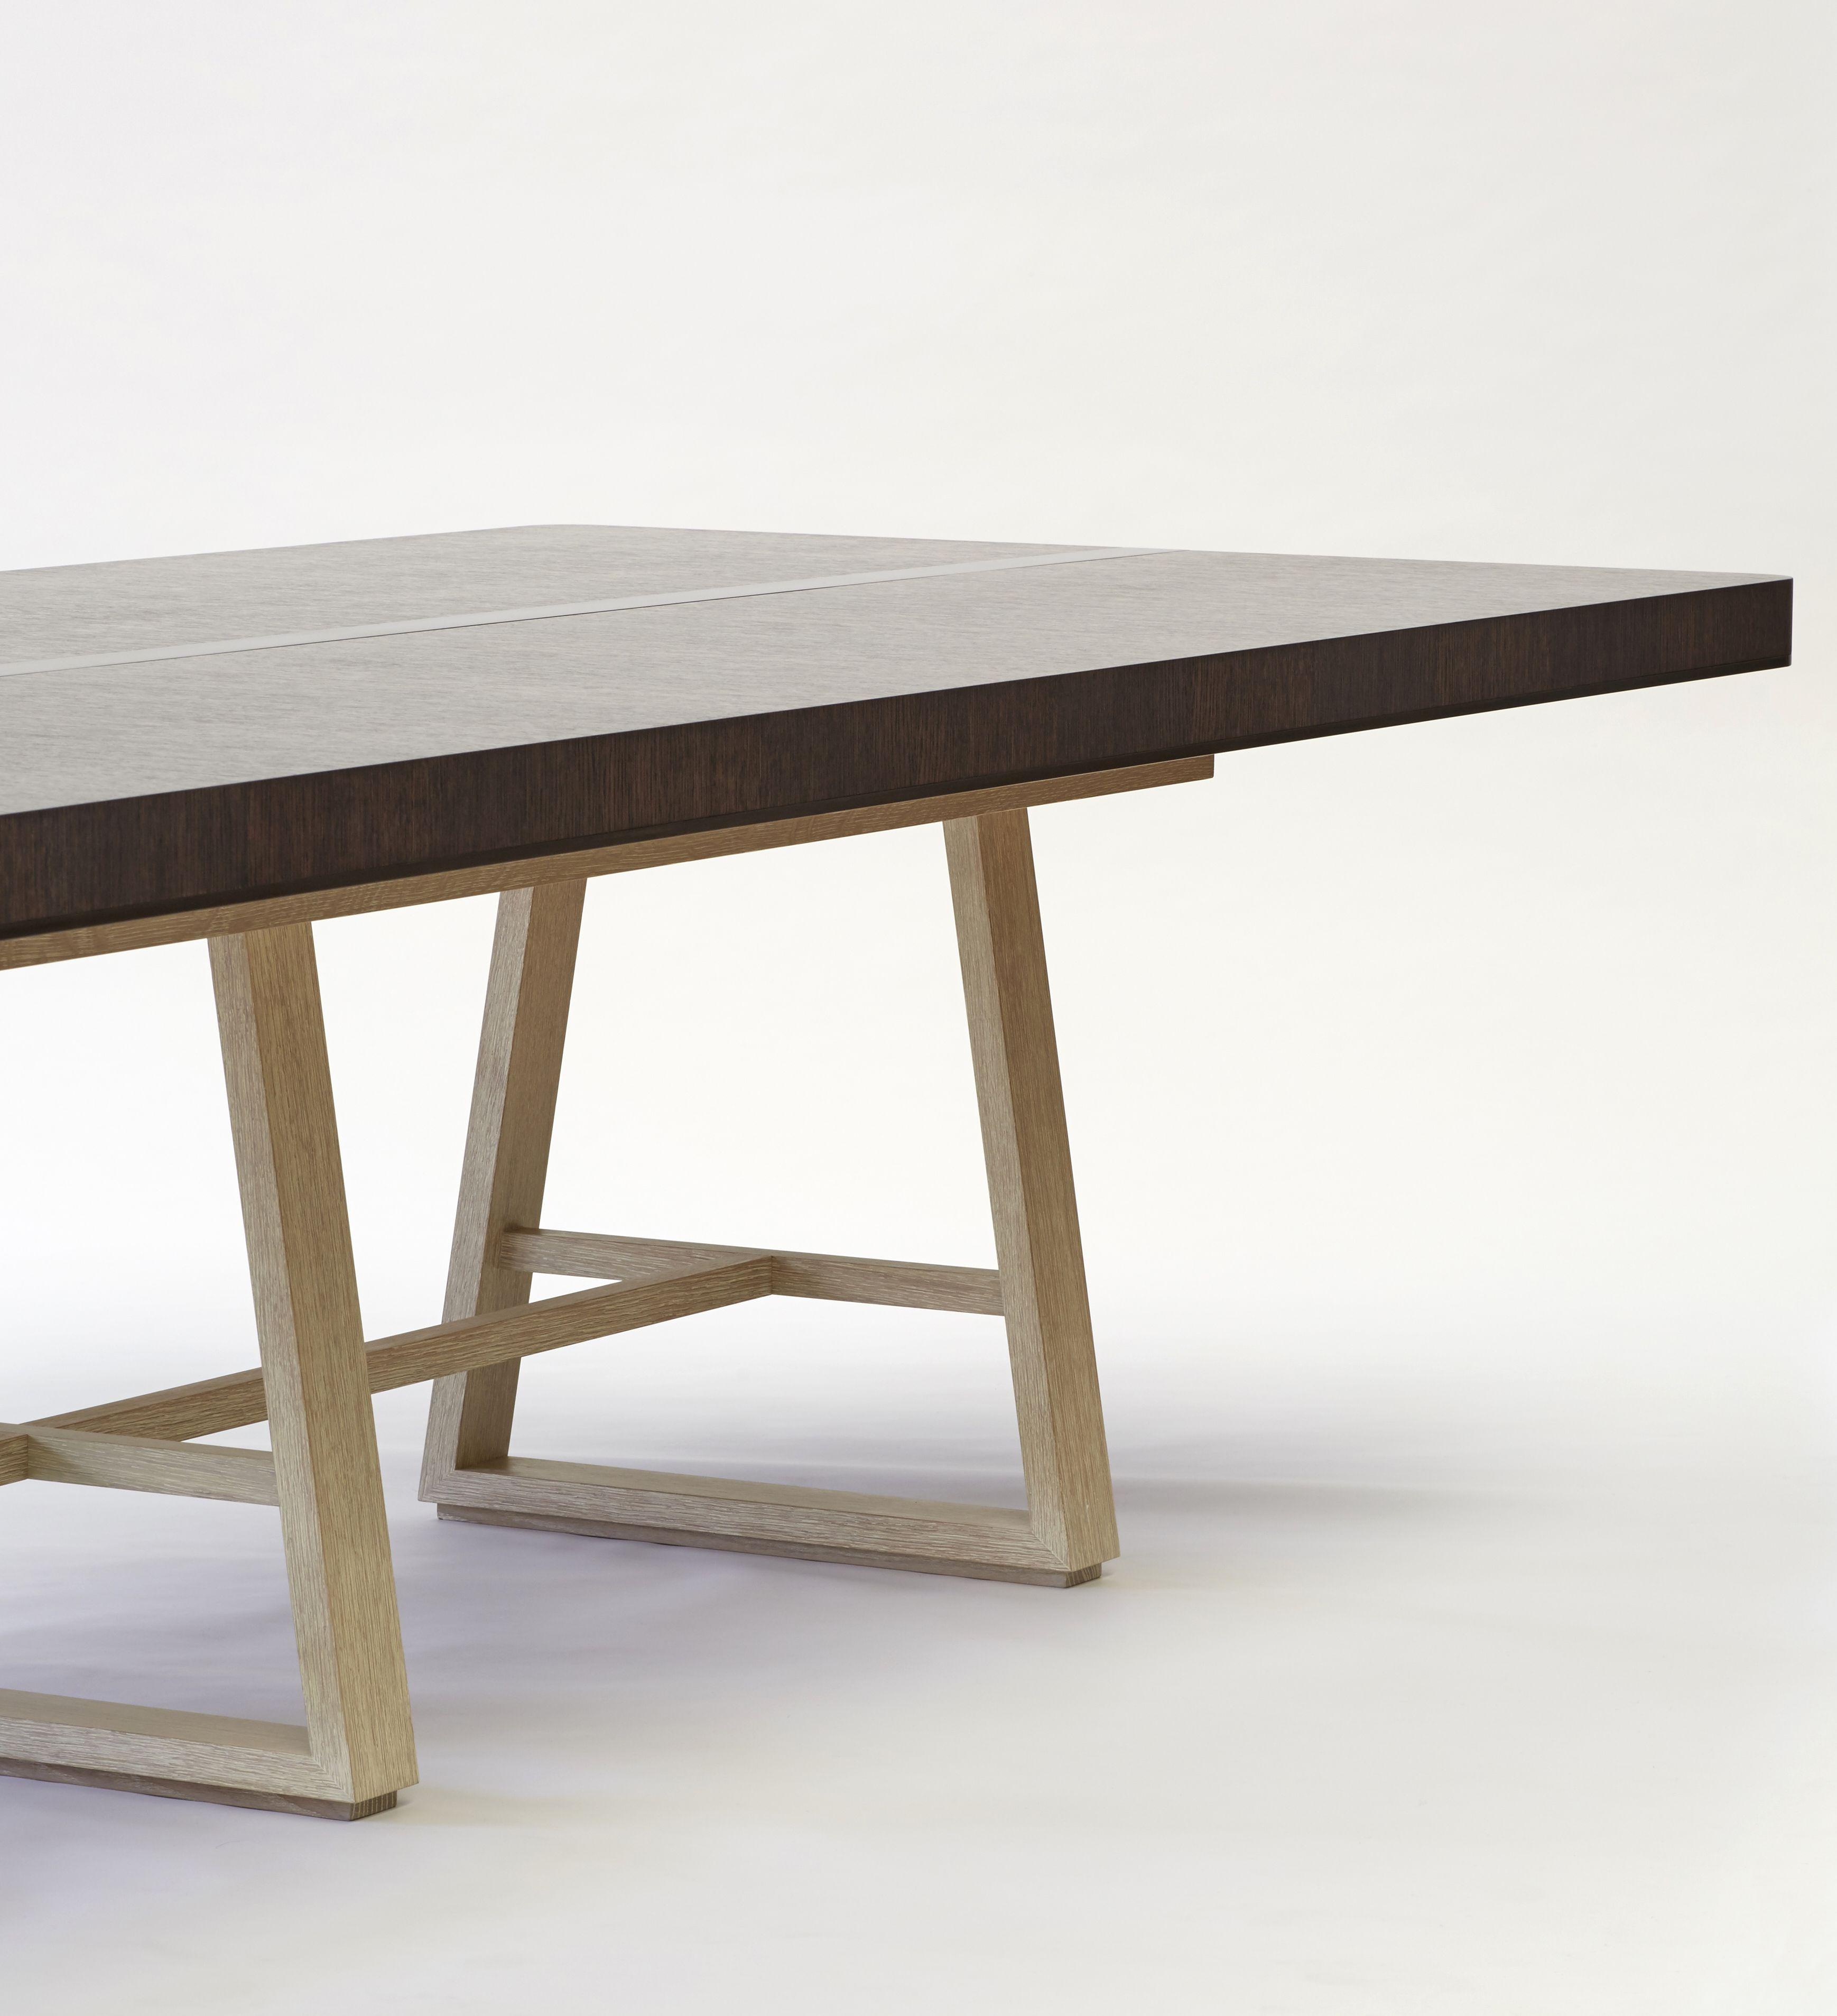 Limed oak base with dark stained oak tabletop